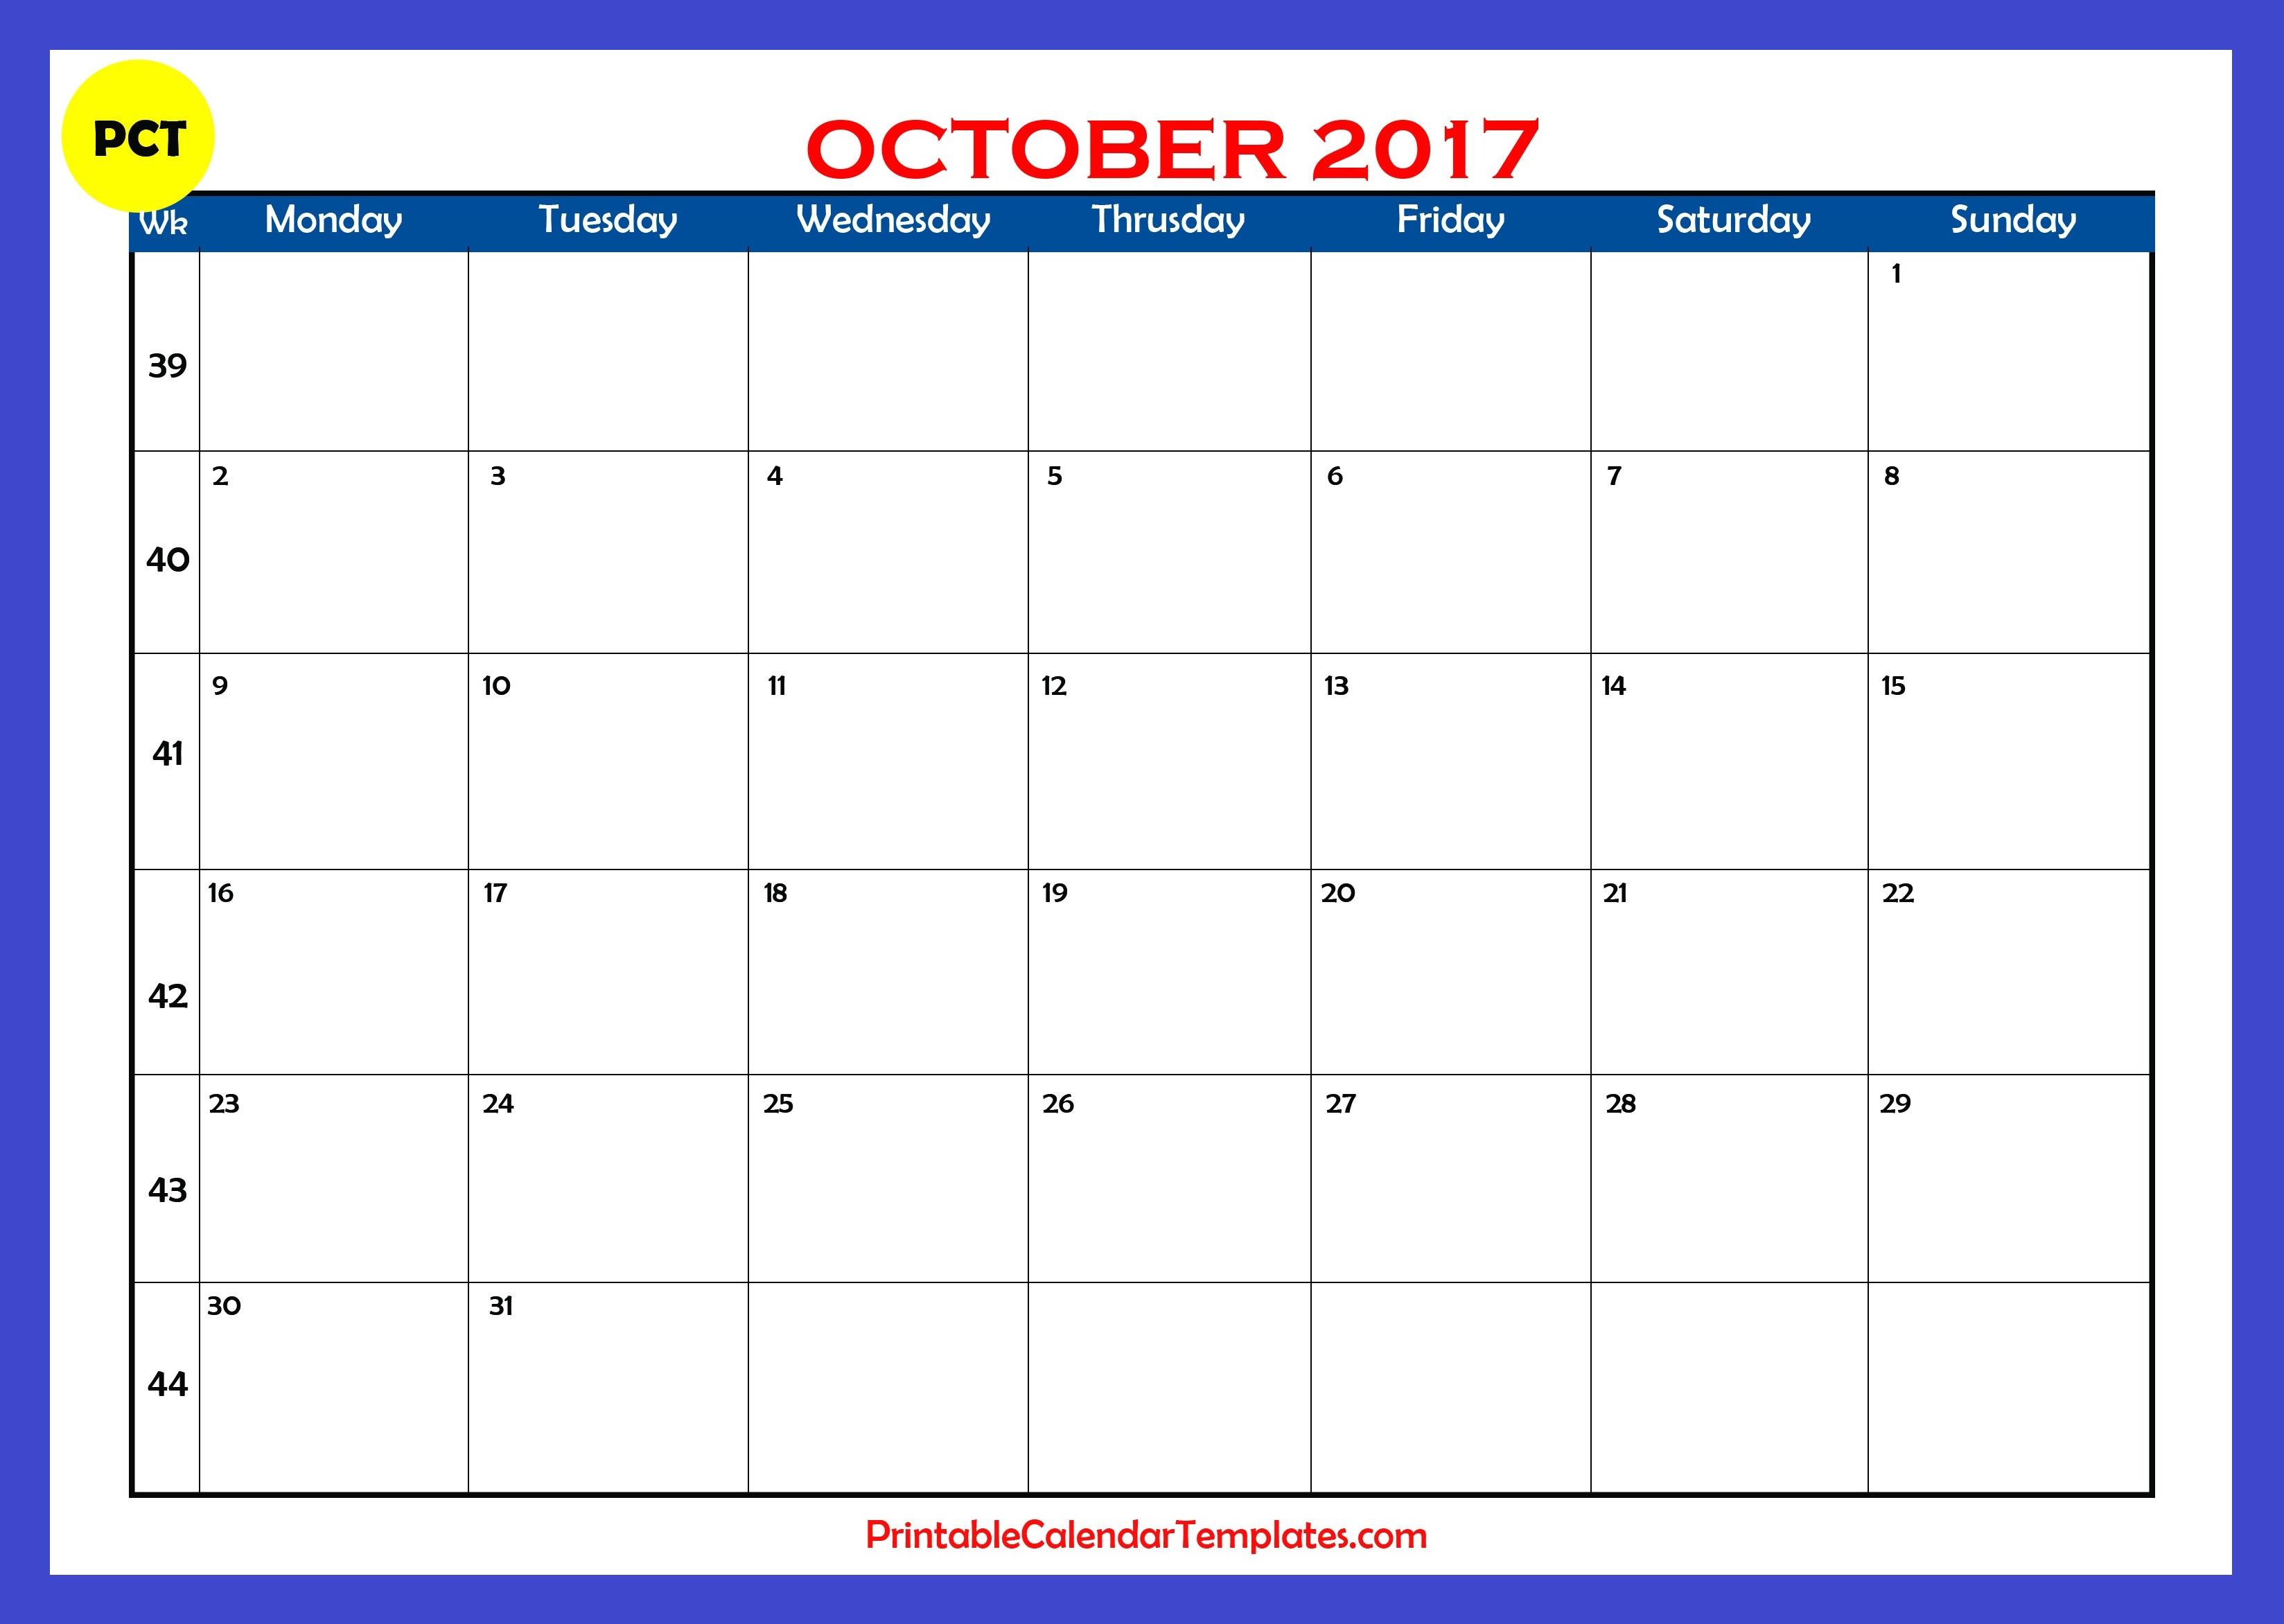 october 2017 calendar, october calendar 2017, october 2017 calendar printable, october calendar 2017 printable